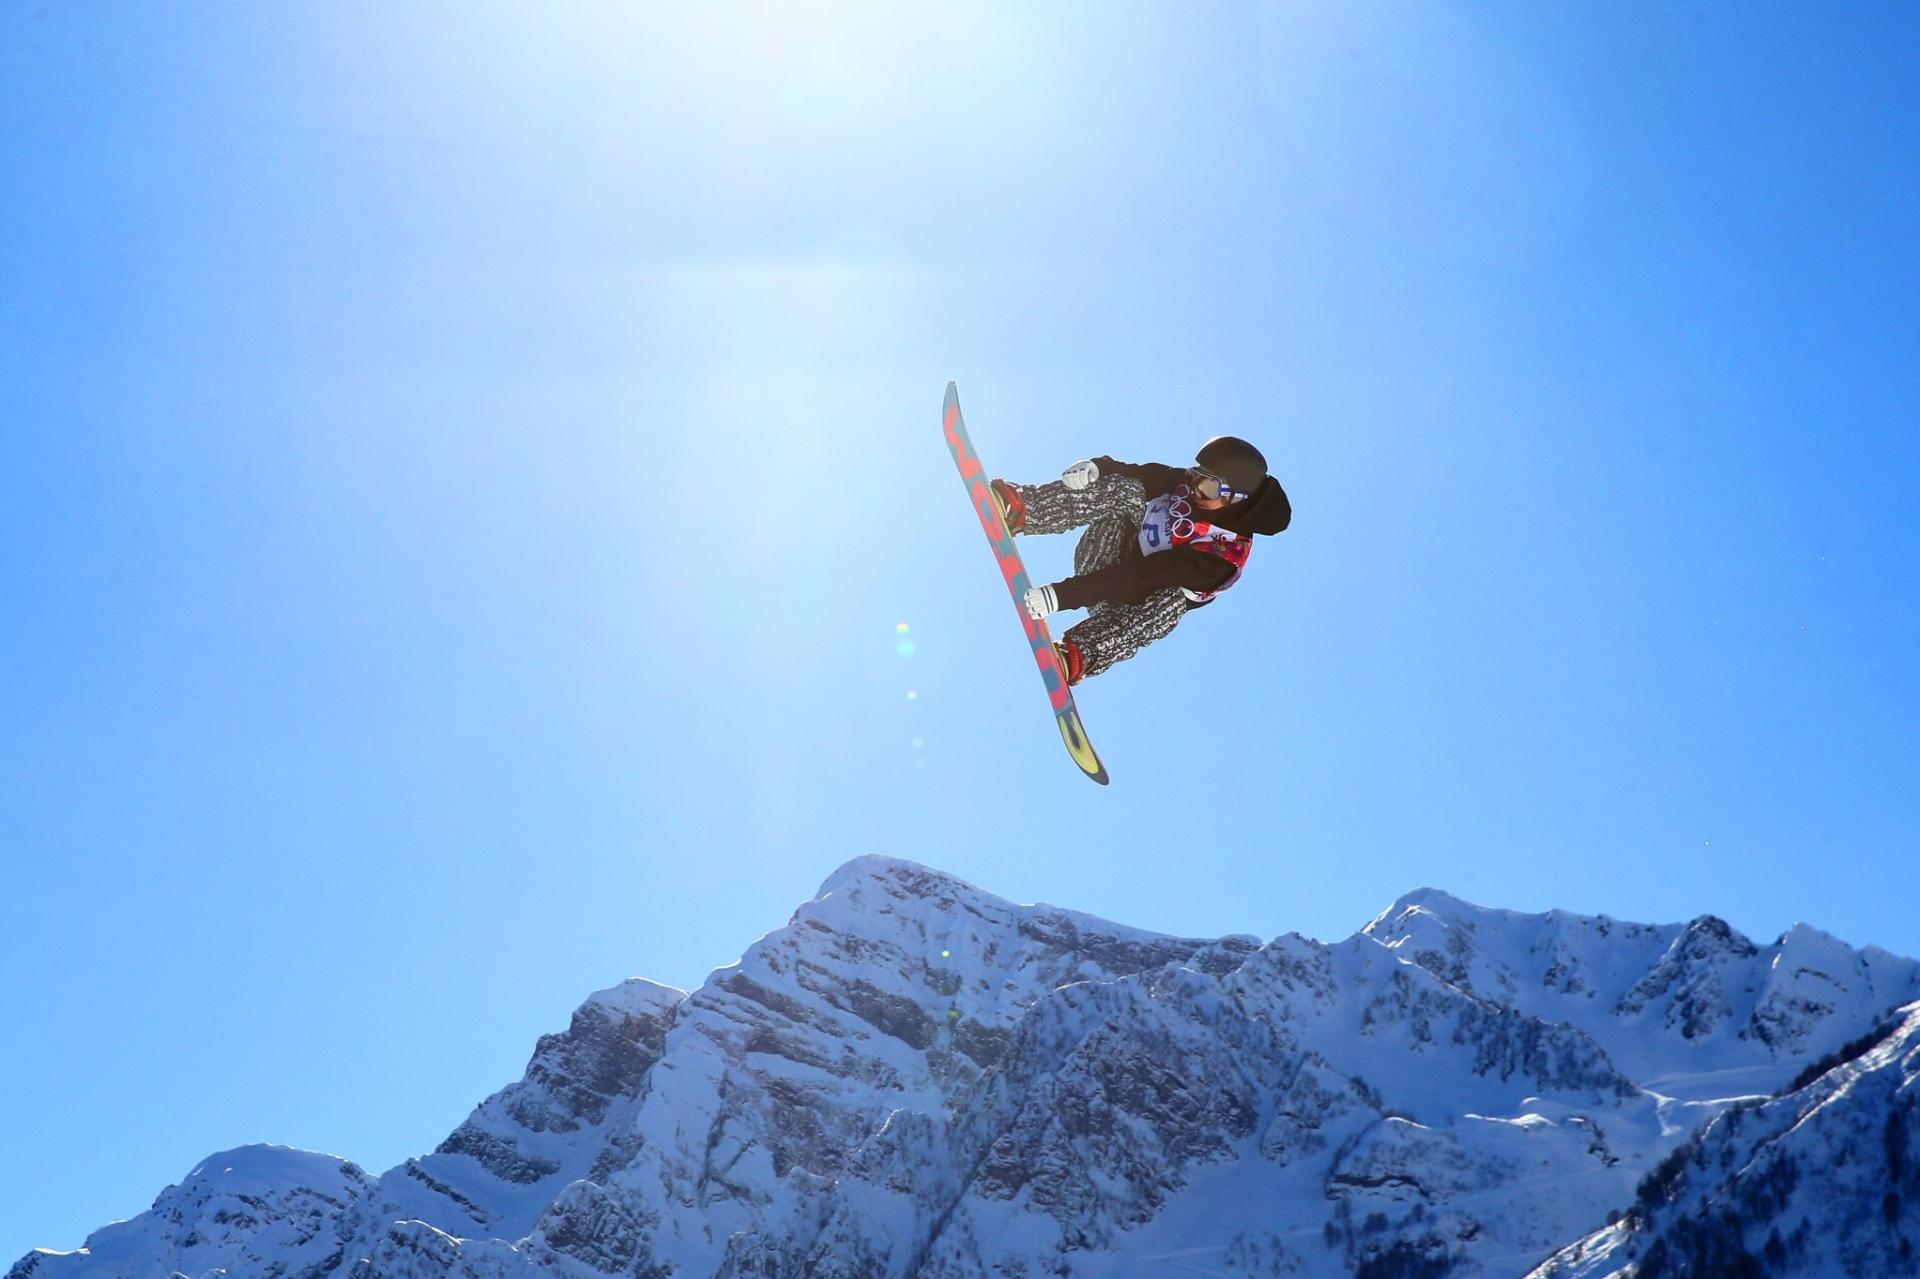 09.02.2014 - Roope Tonteri, da Finlândia, aponta seu snowboard para o sol na prova do slopestyle